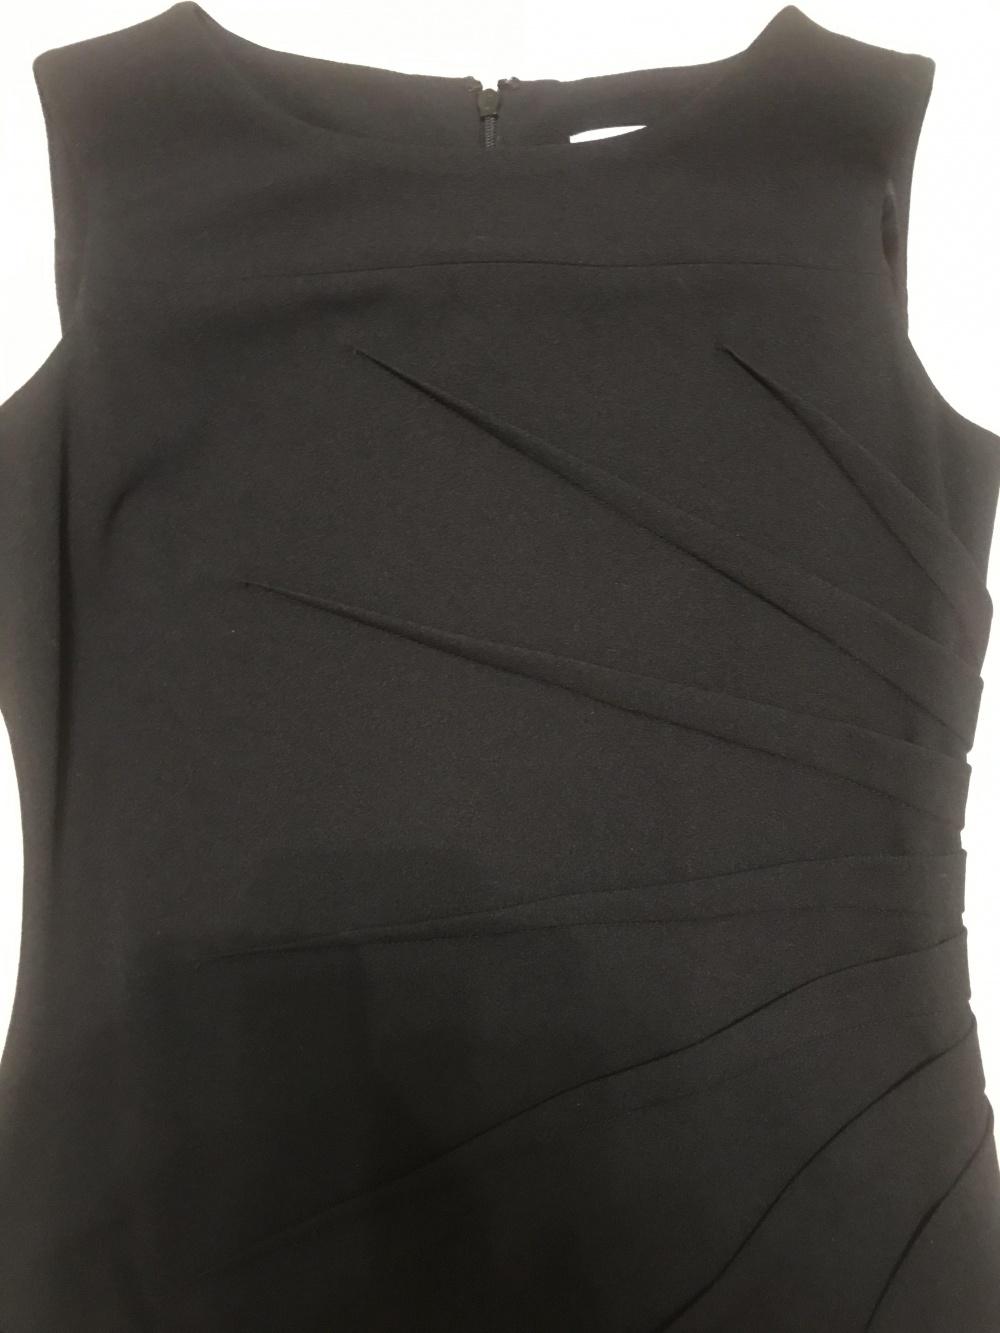 Платье Calvin Klein, размер S